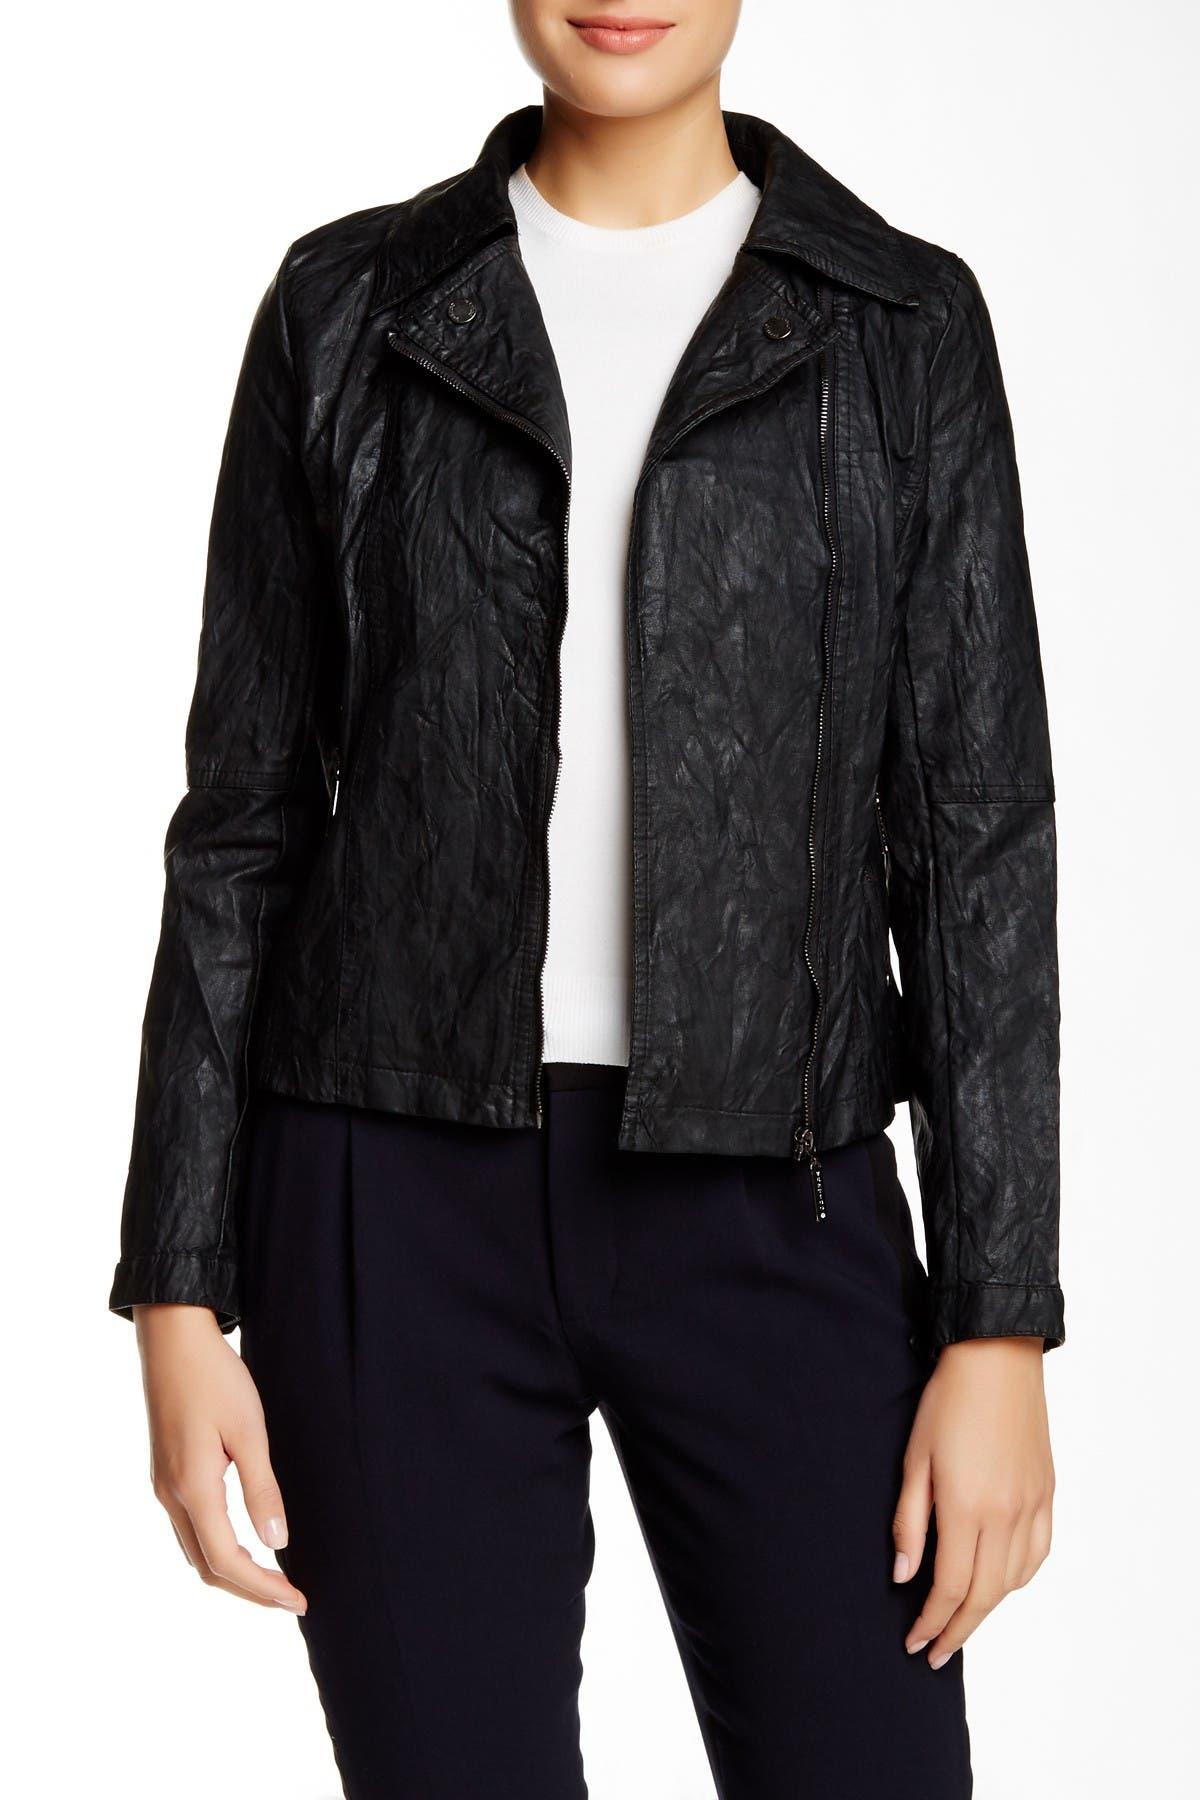 Image of Vertigo Faux Leather Jacket